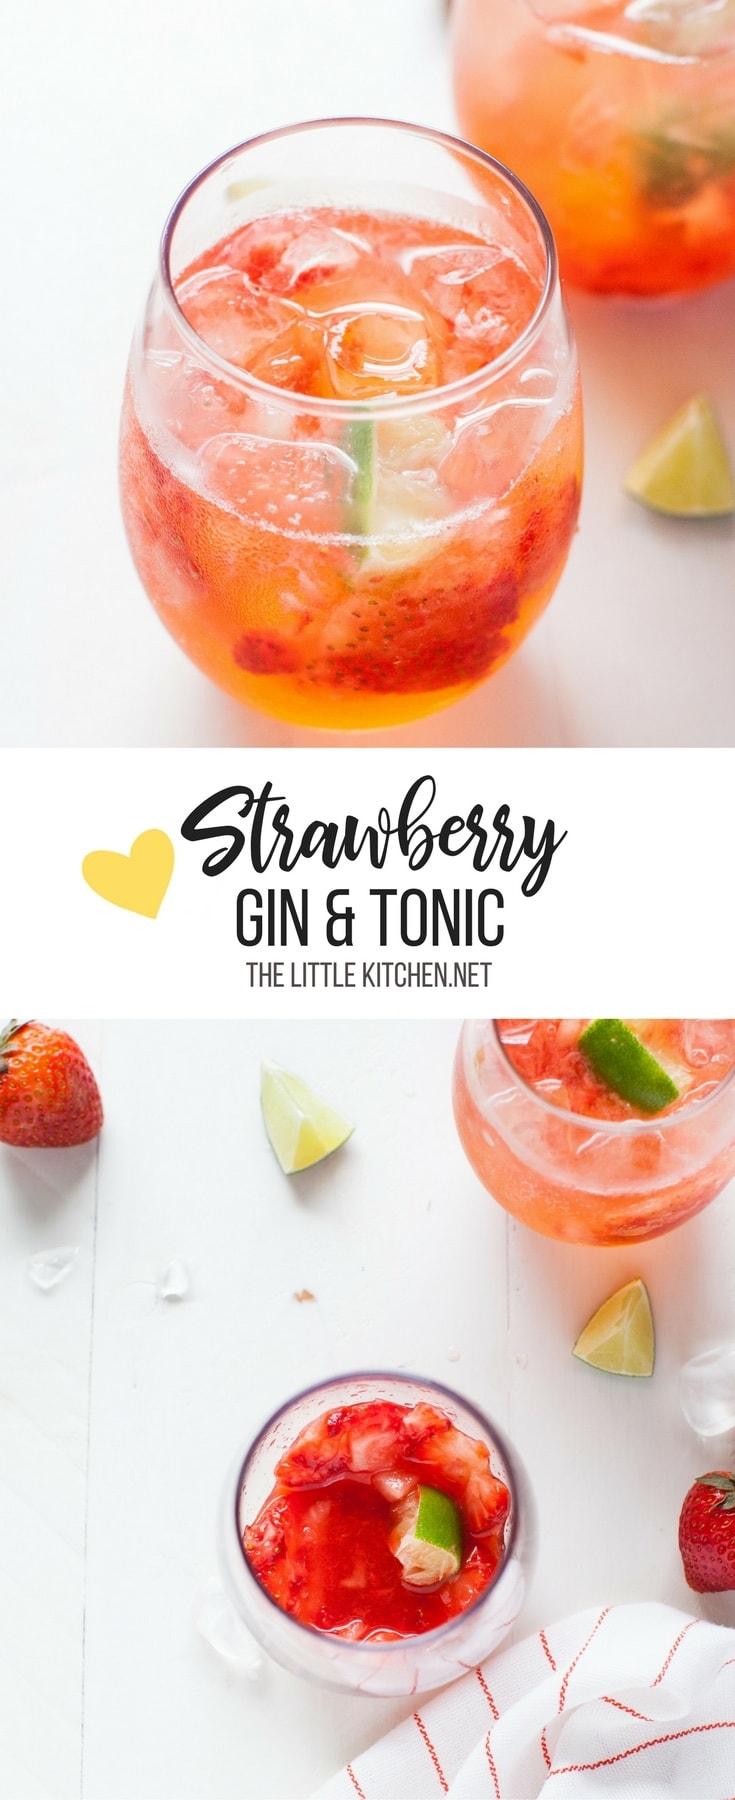 strawberry gin and tonic thelittlekitchen.net